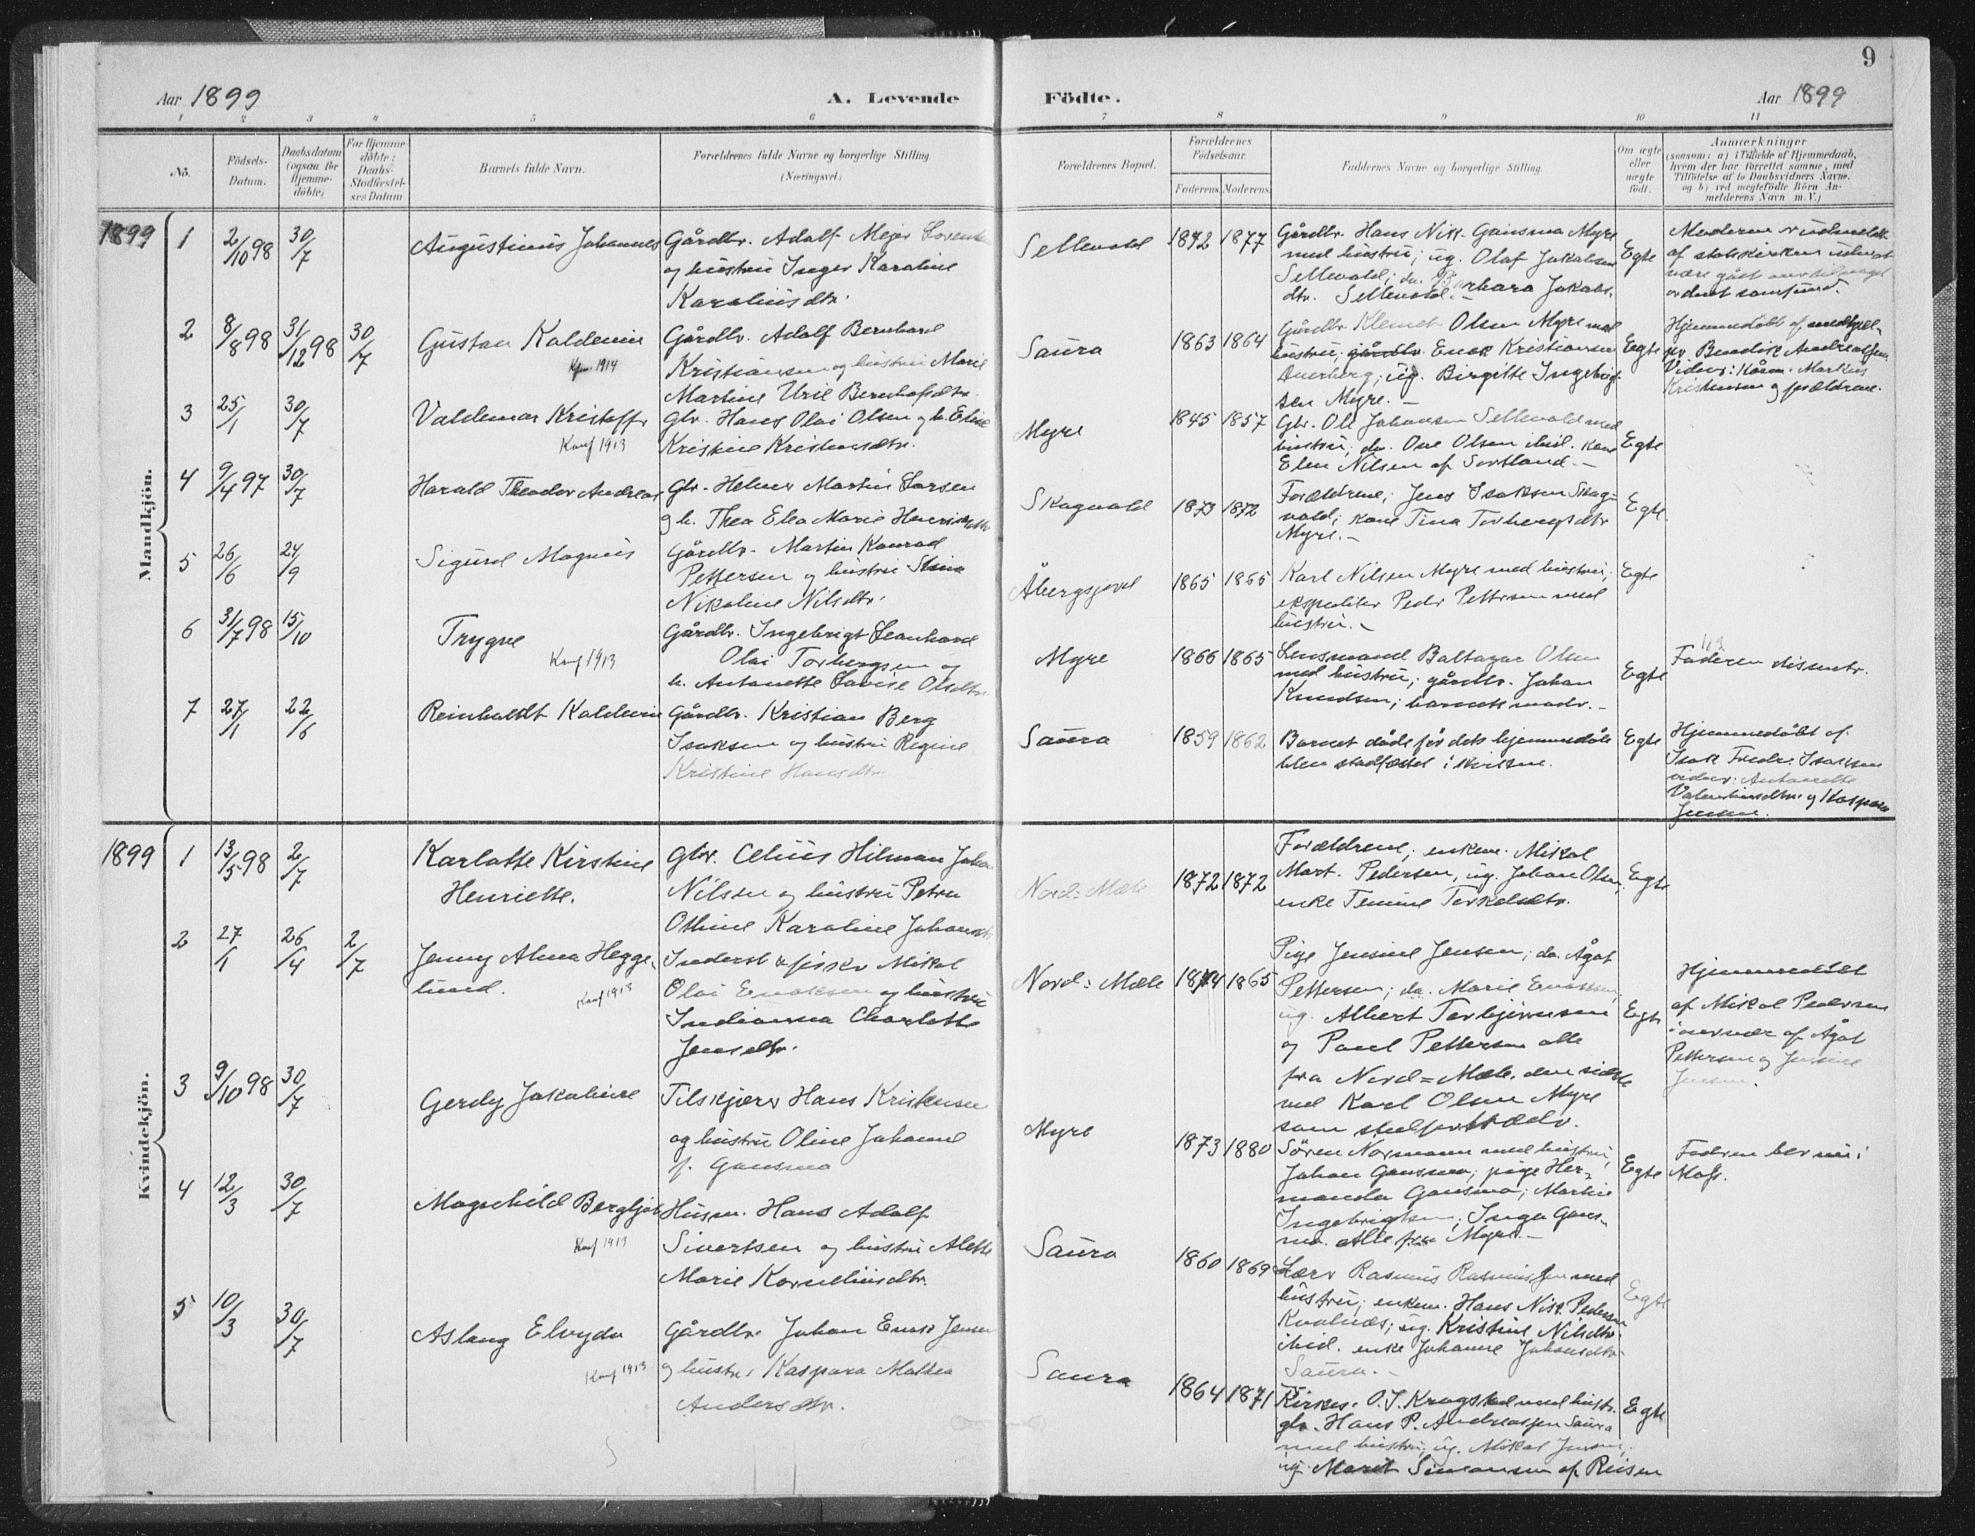 SAT, Ministerialprotokoller, klokkerbøker og fødselsregistre - Nordland, 897/L1400: Ministerialbok nr. 897A07, 1897-1908, s. 9